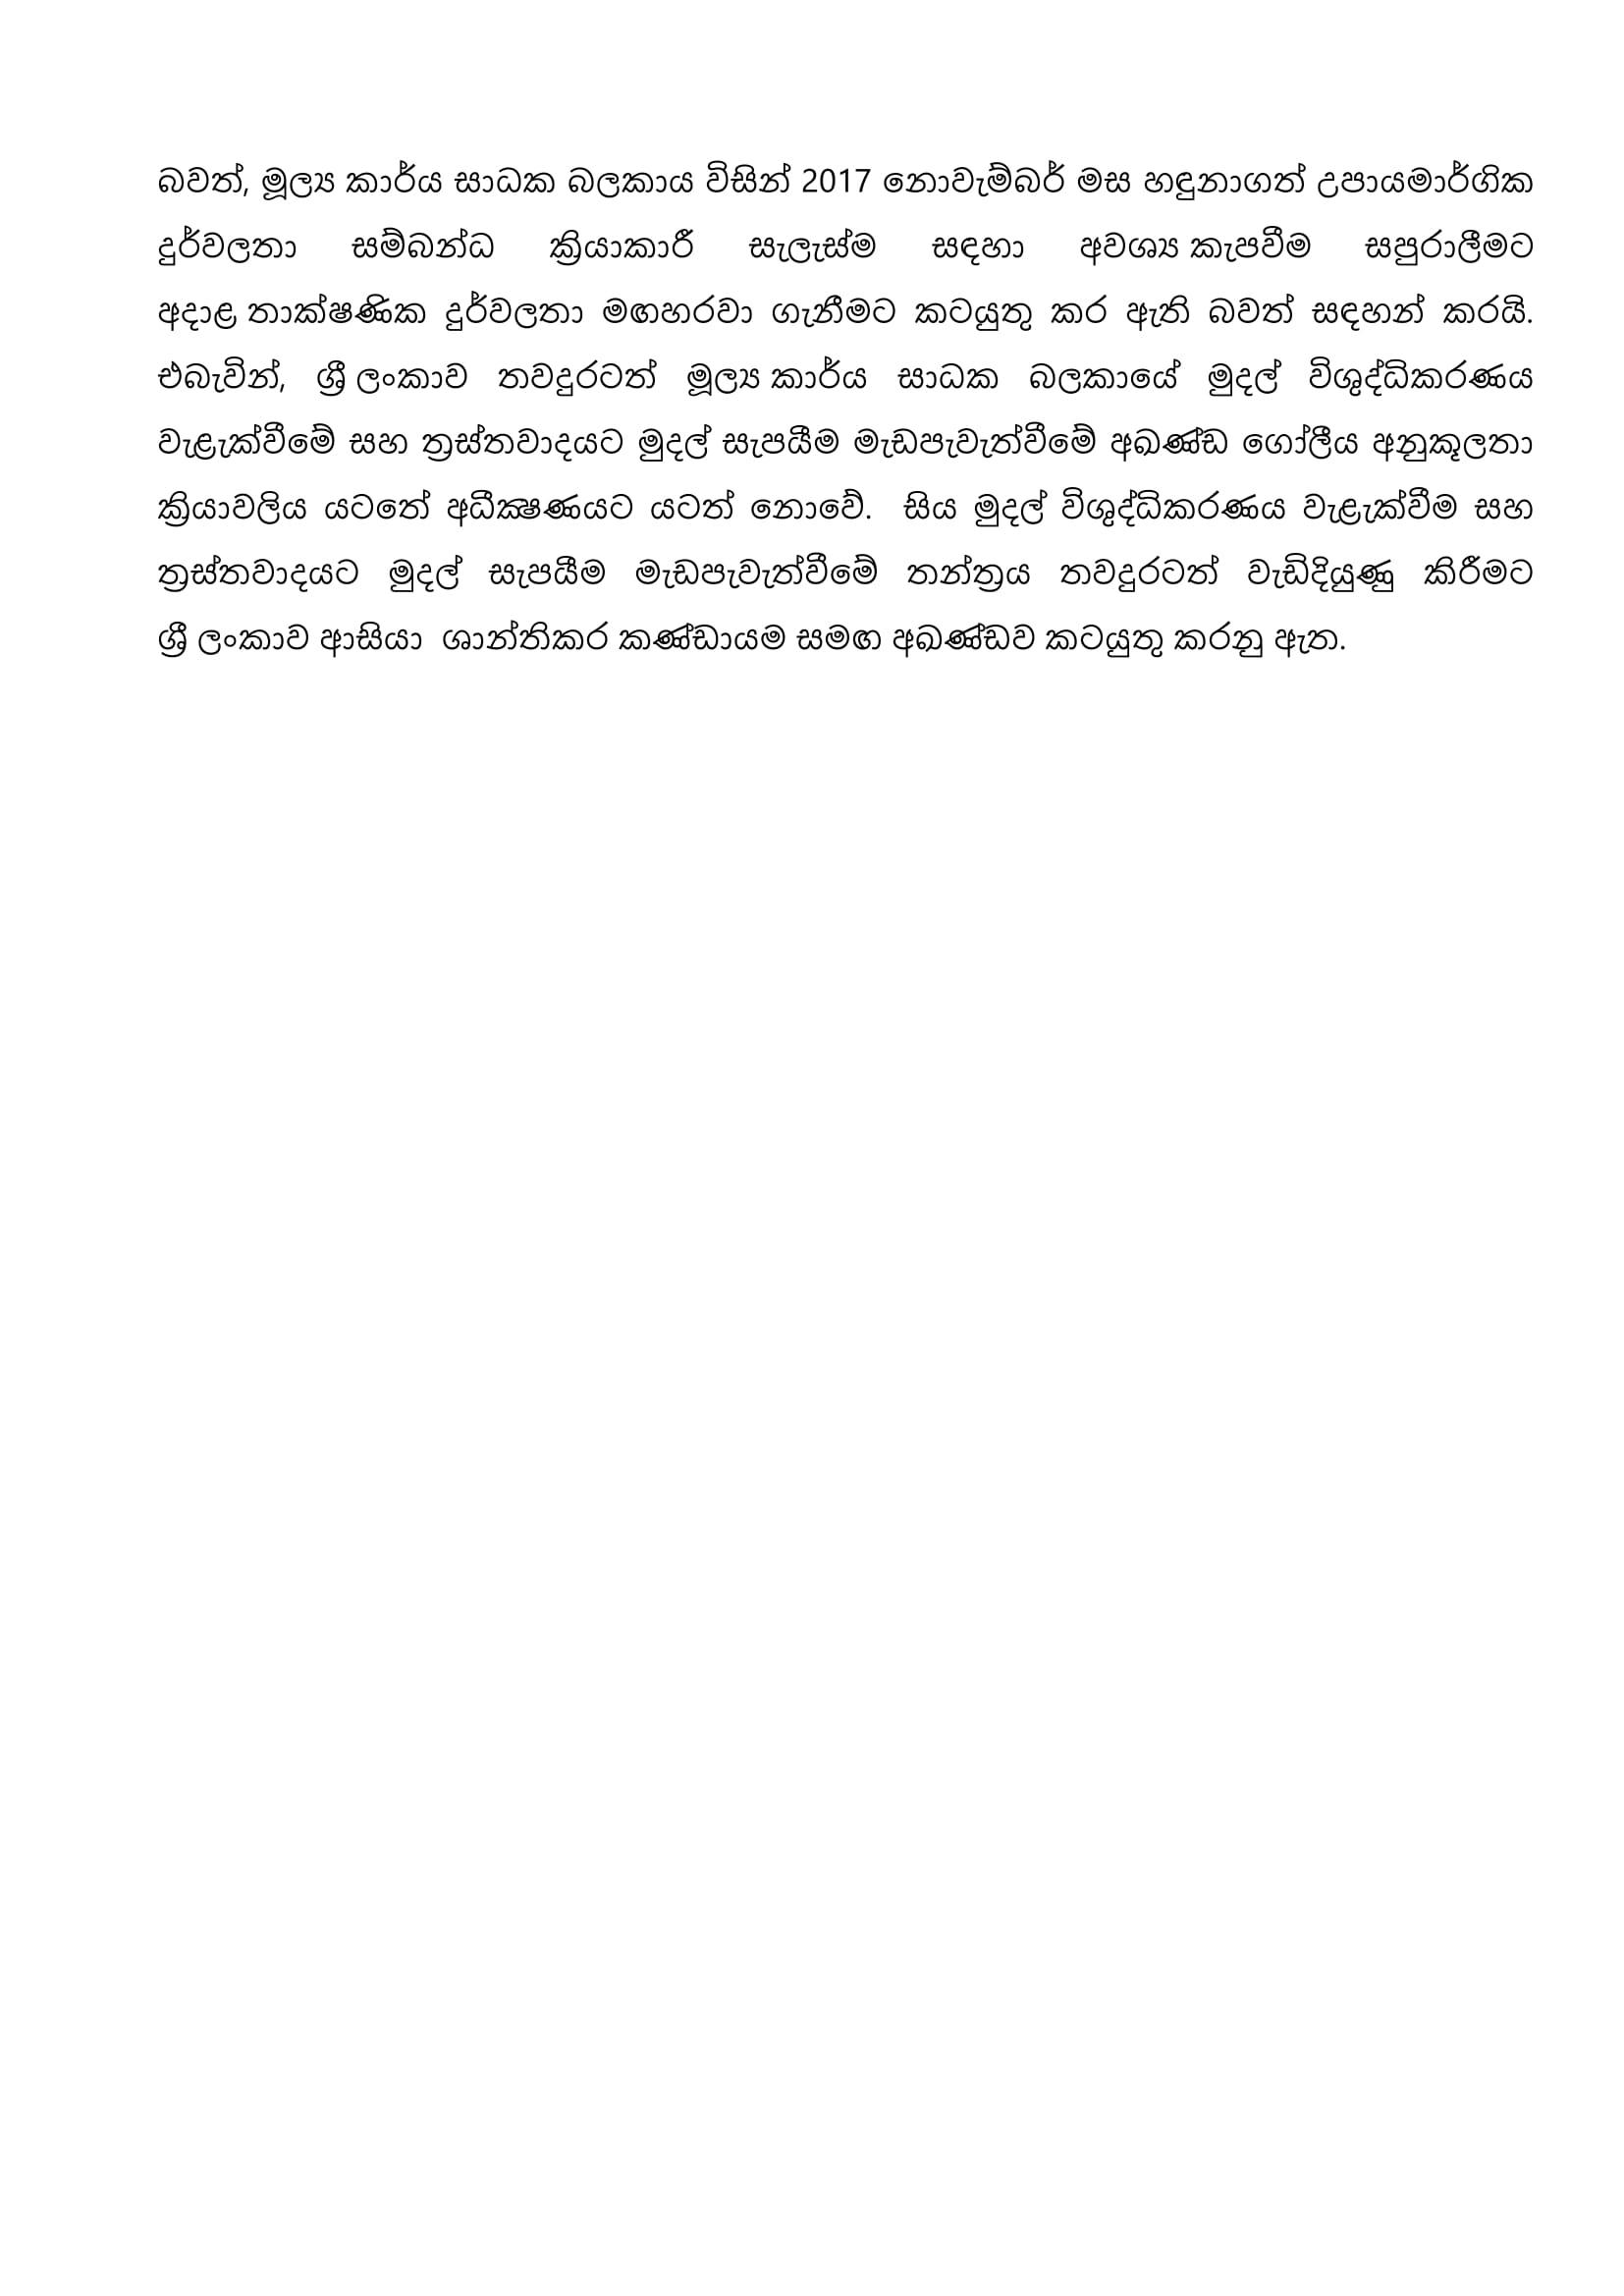 Press Release - 2019 10 21 Sinhala-4